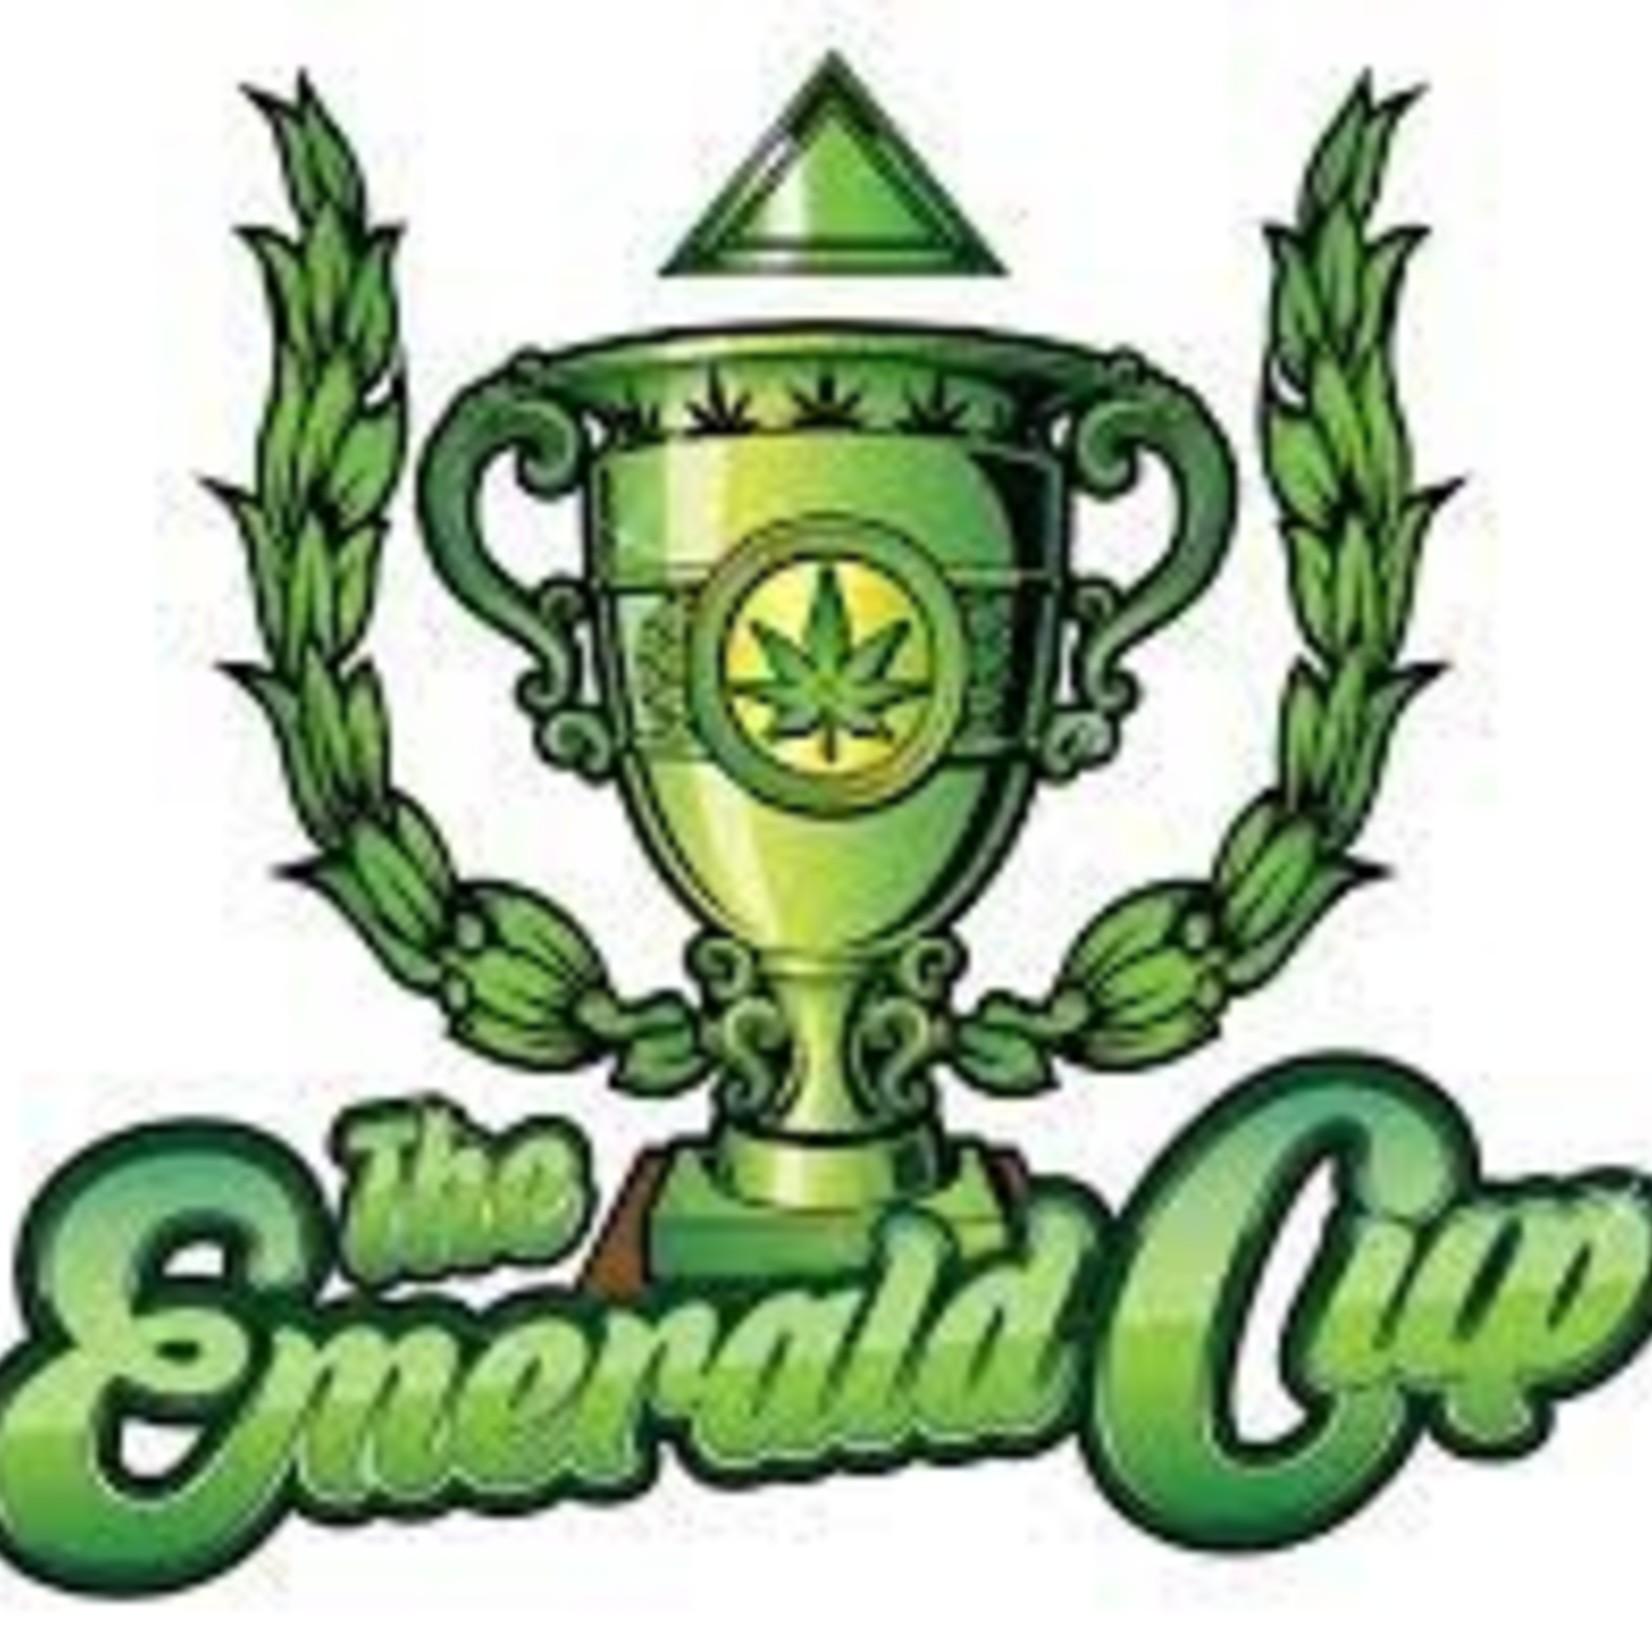 Emerald Cup / Bianchetto (Live Rosin)